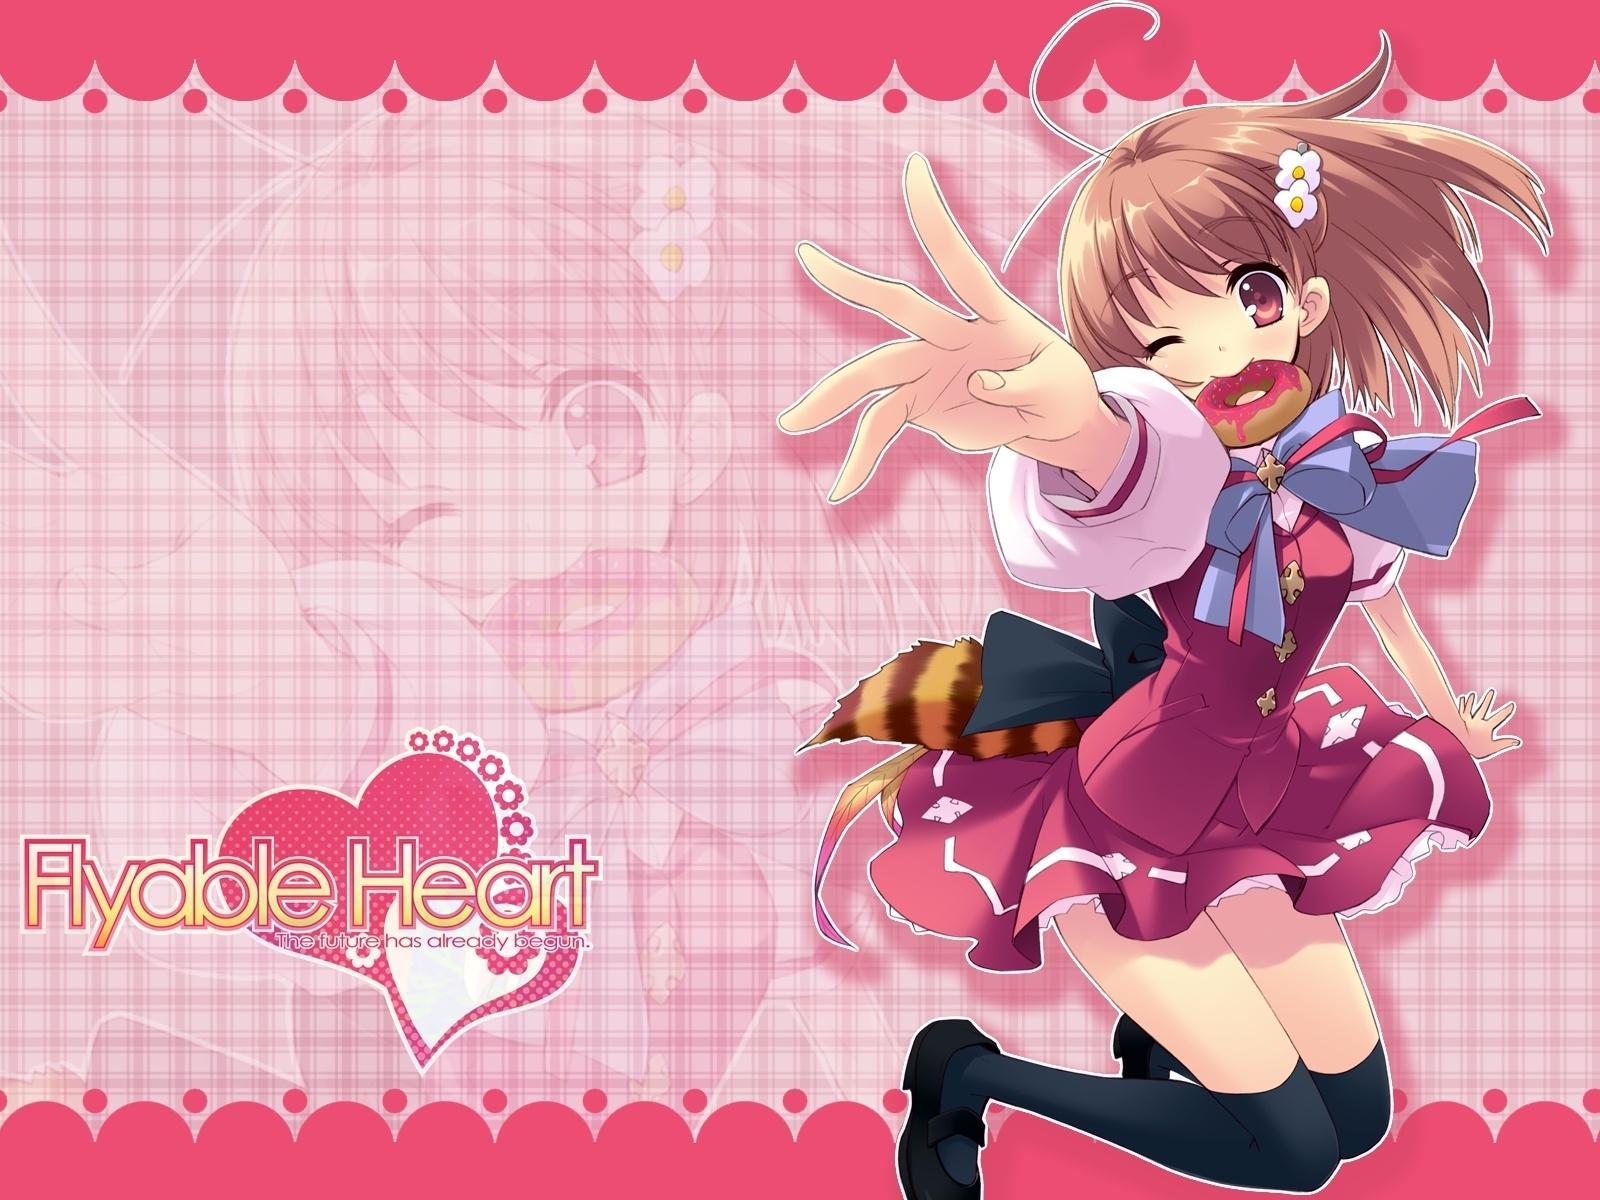 Photos Flyable Heart Games vdeo game